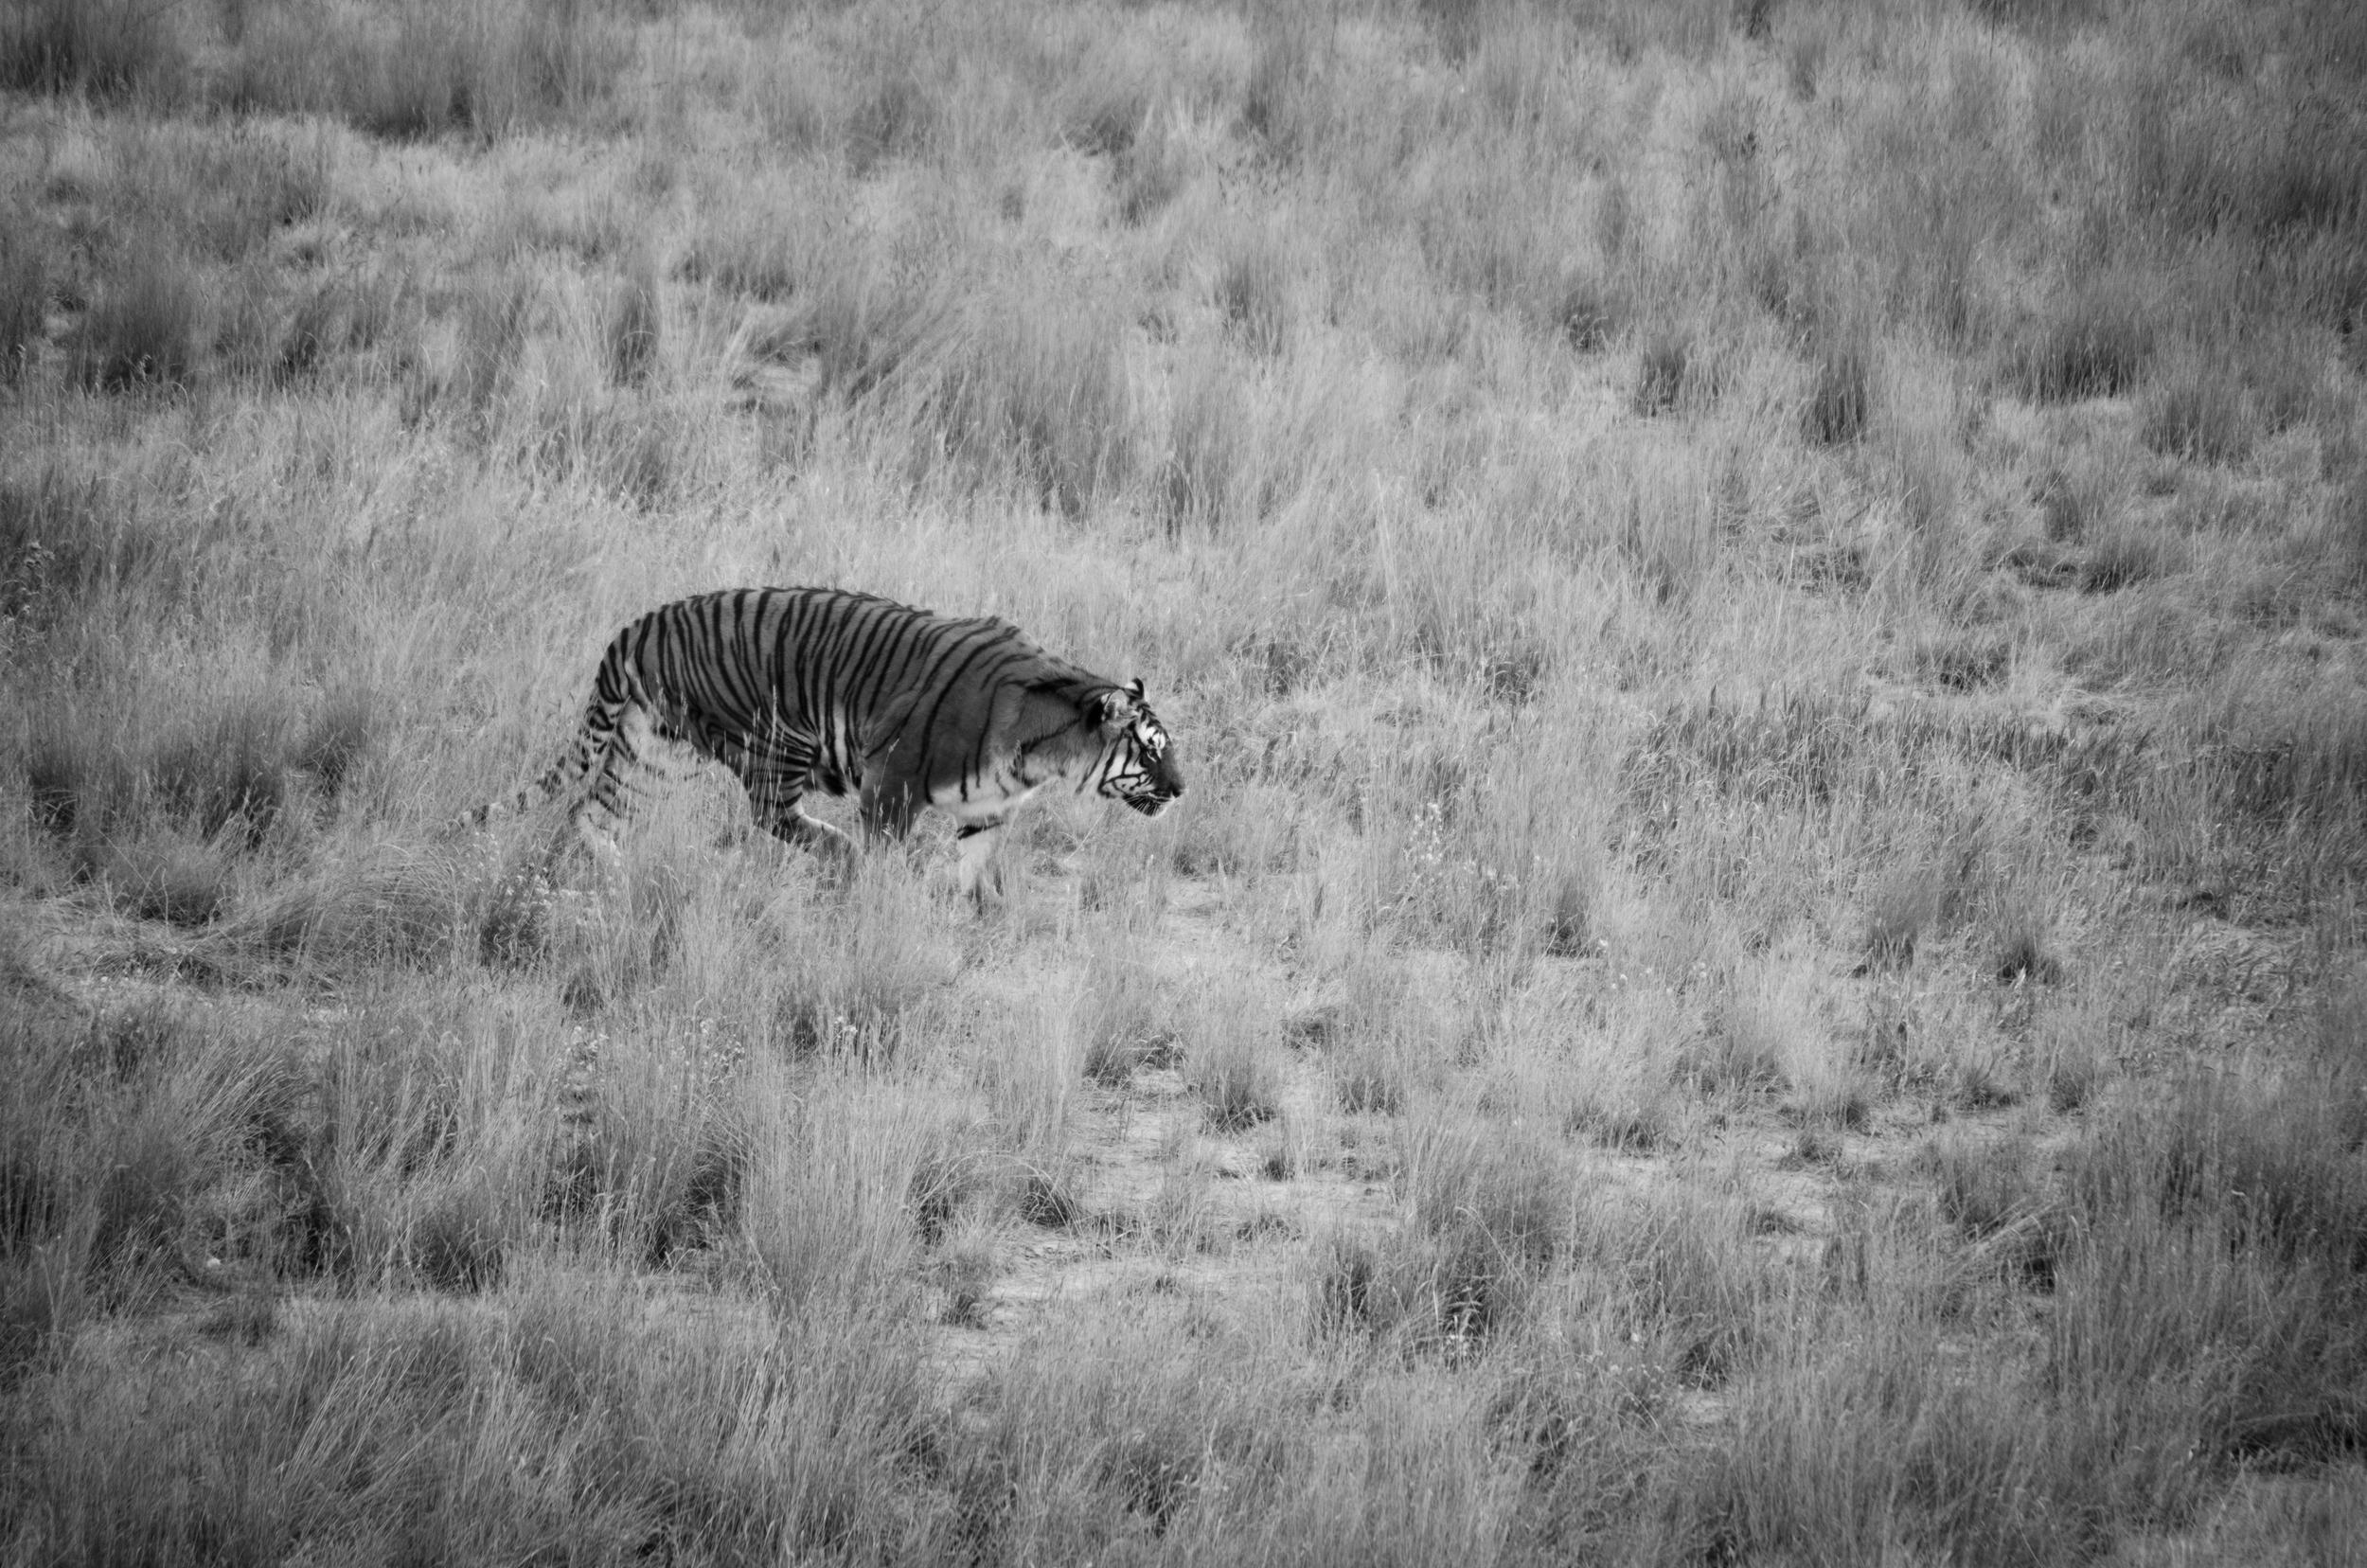 Tiger stalking at Colorado Wild Animal Sanctuary 2015